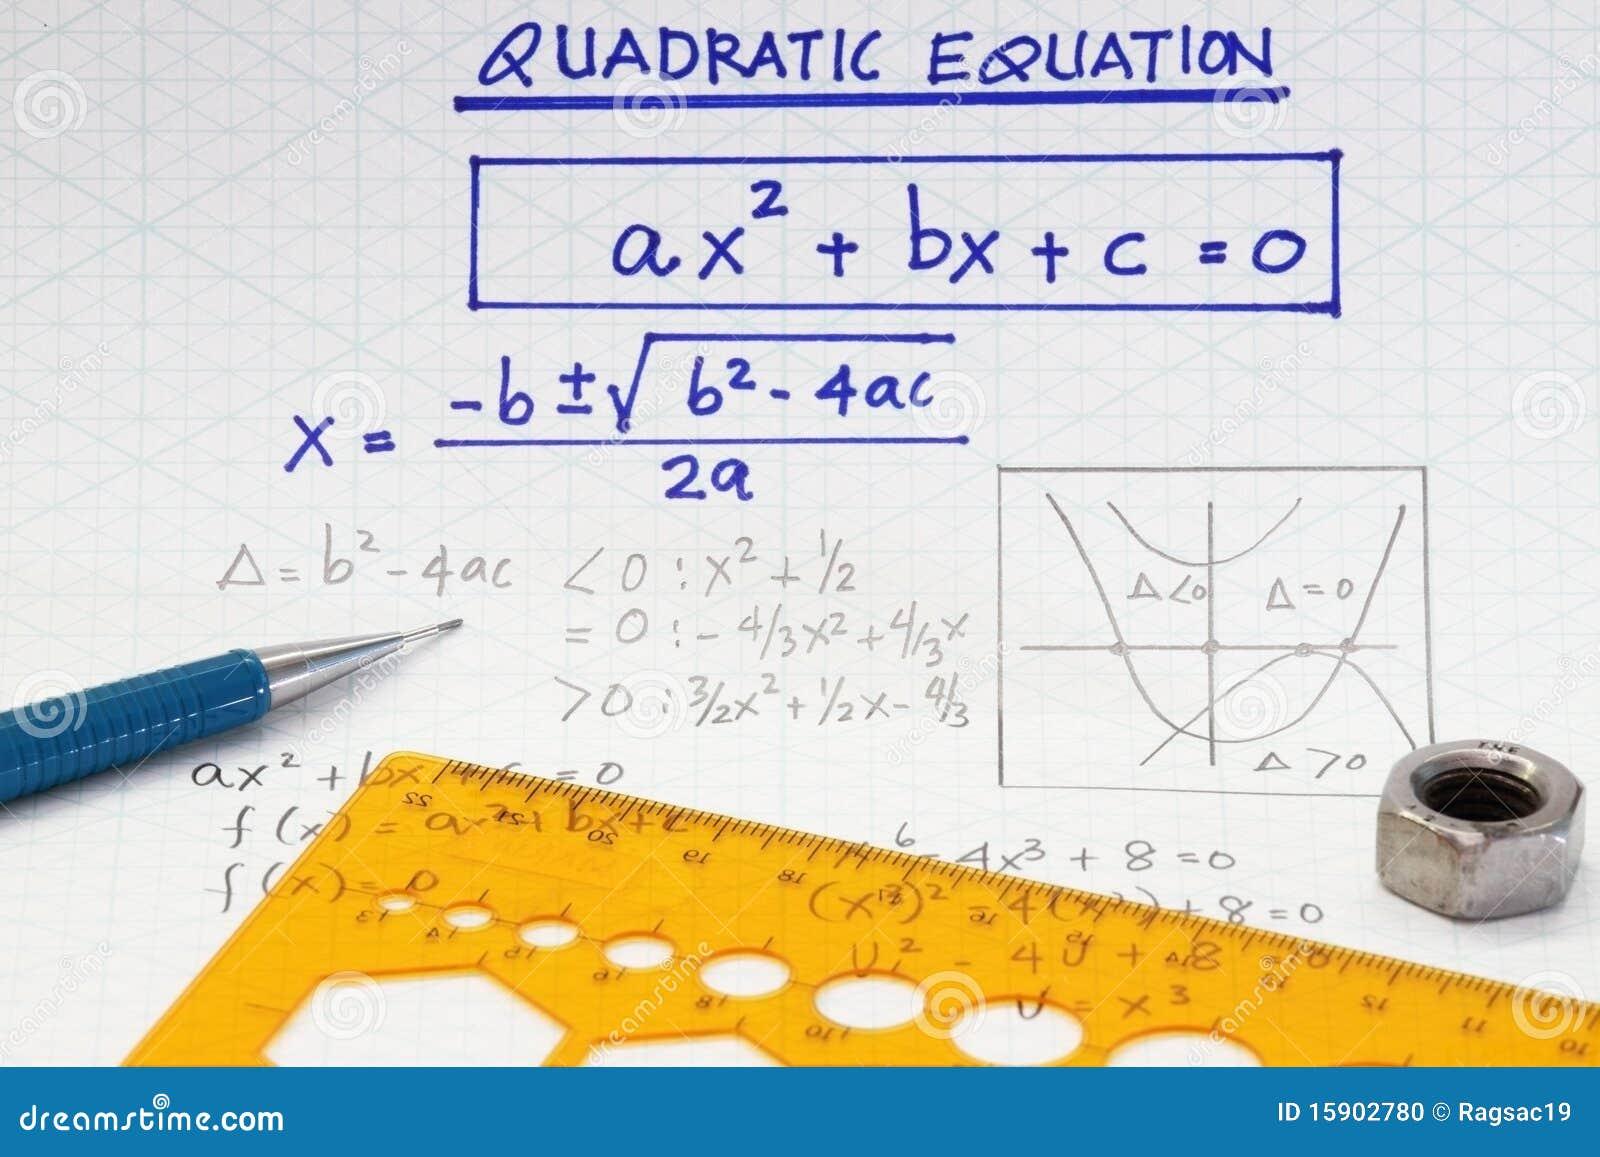 Quadratic Equations Stock Photo - Image: 15902780  Quadratic Equat...